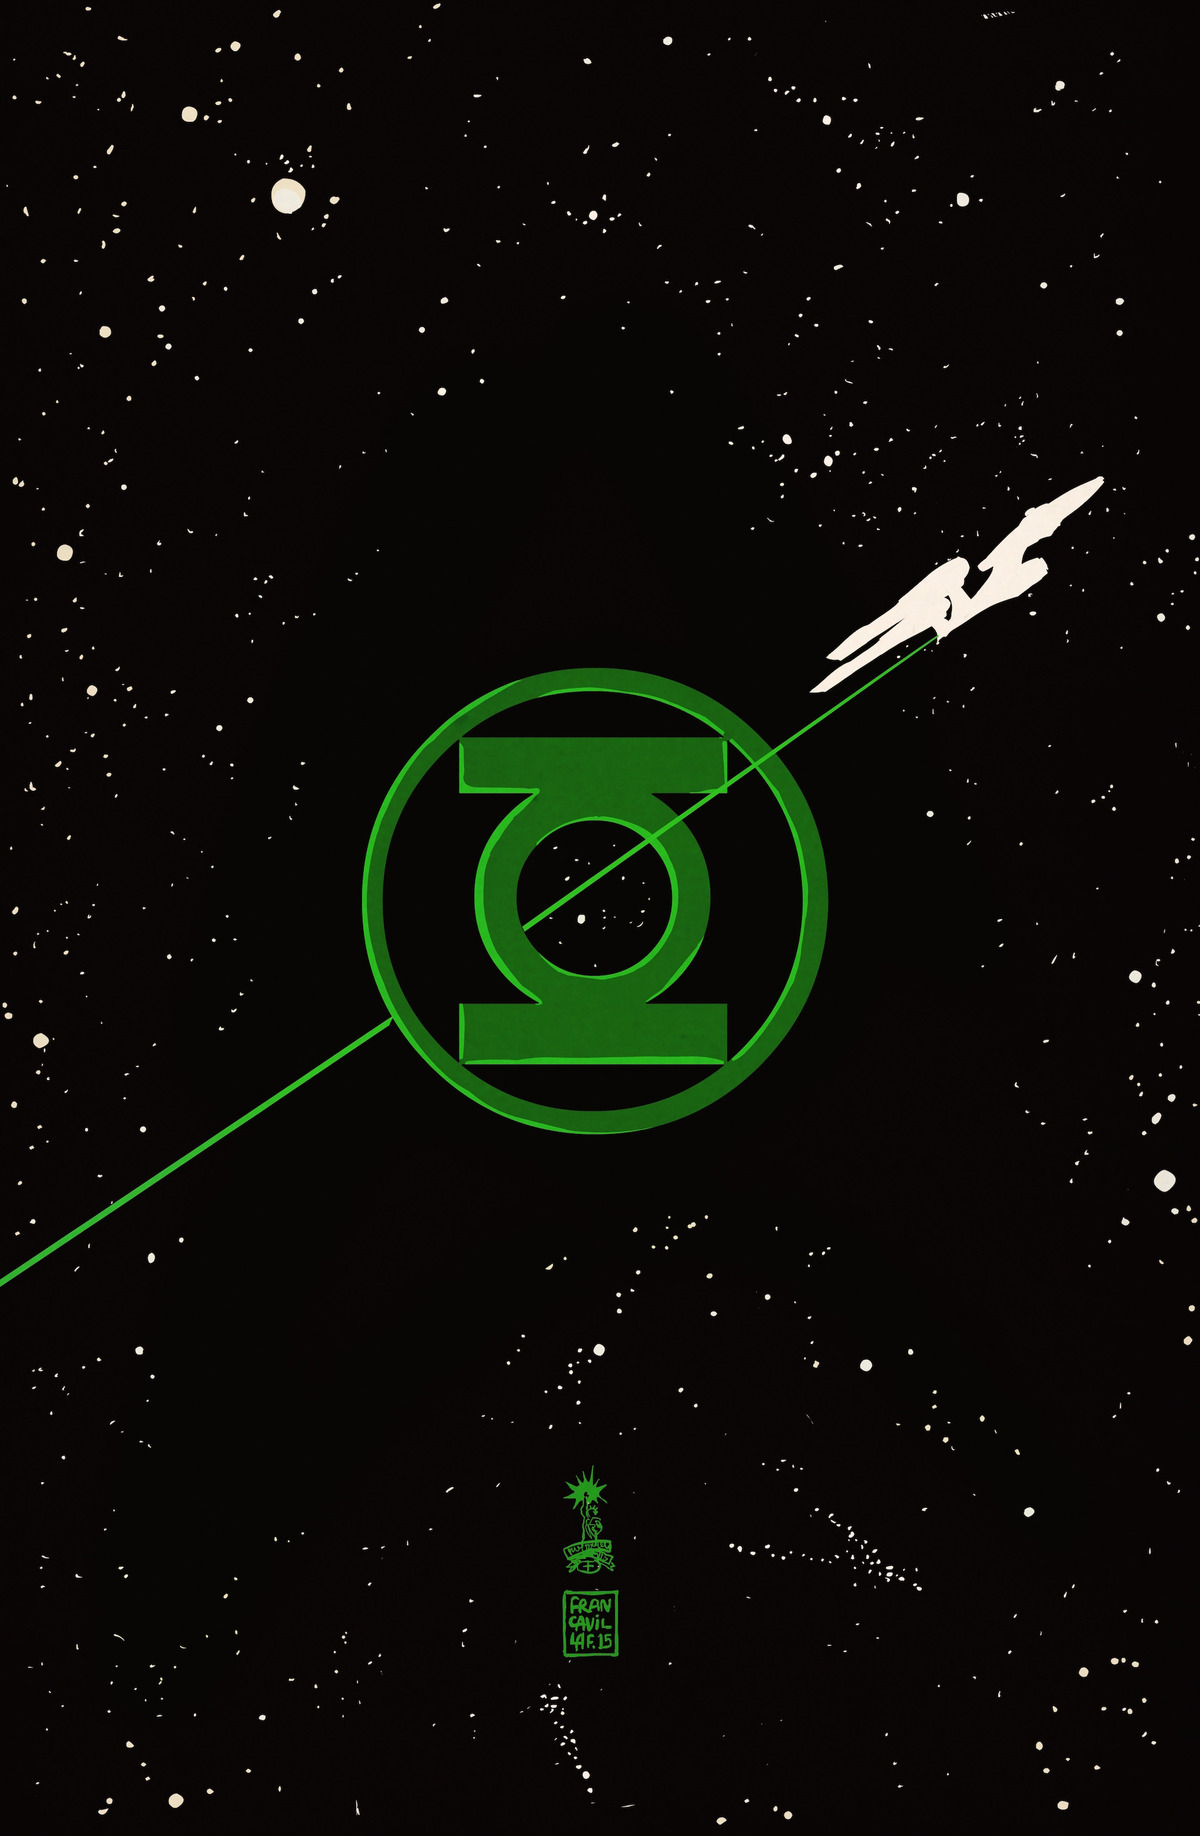 star trek green lantern 01